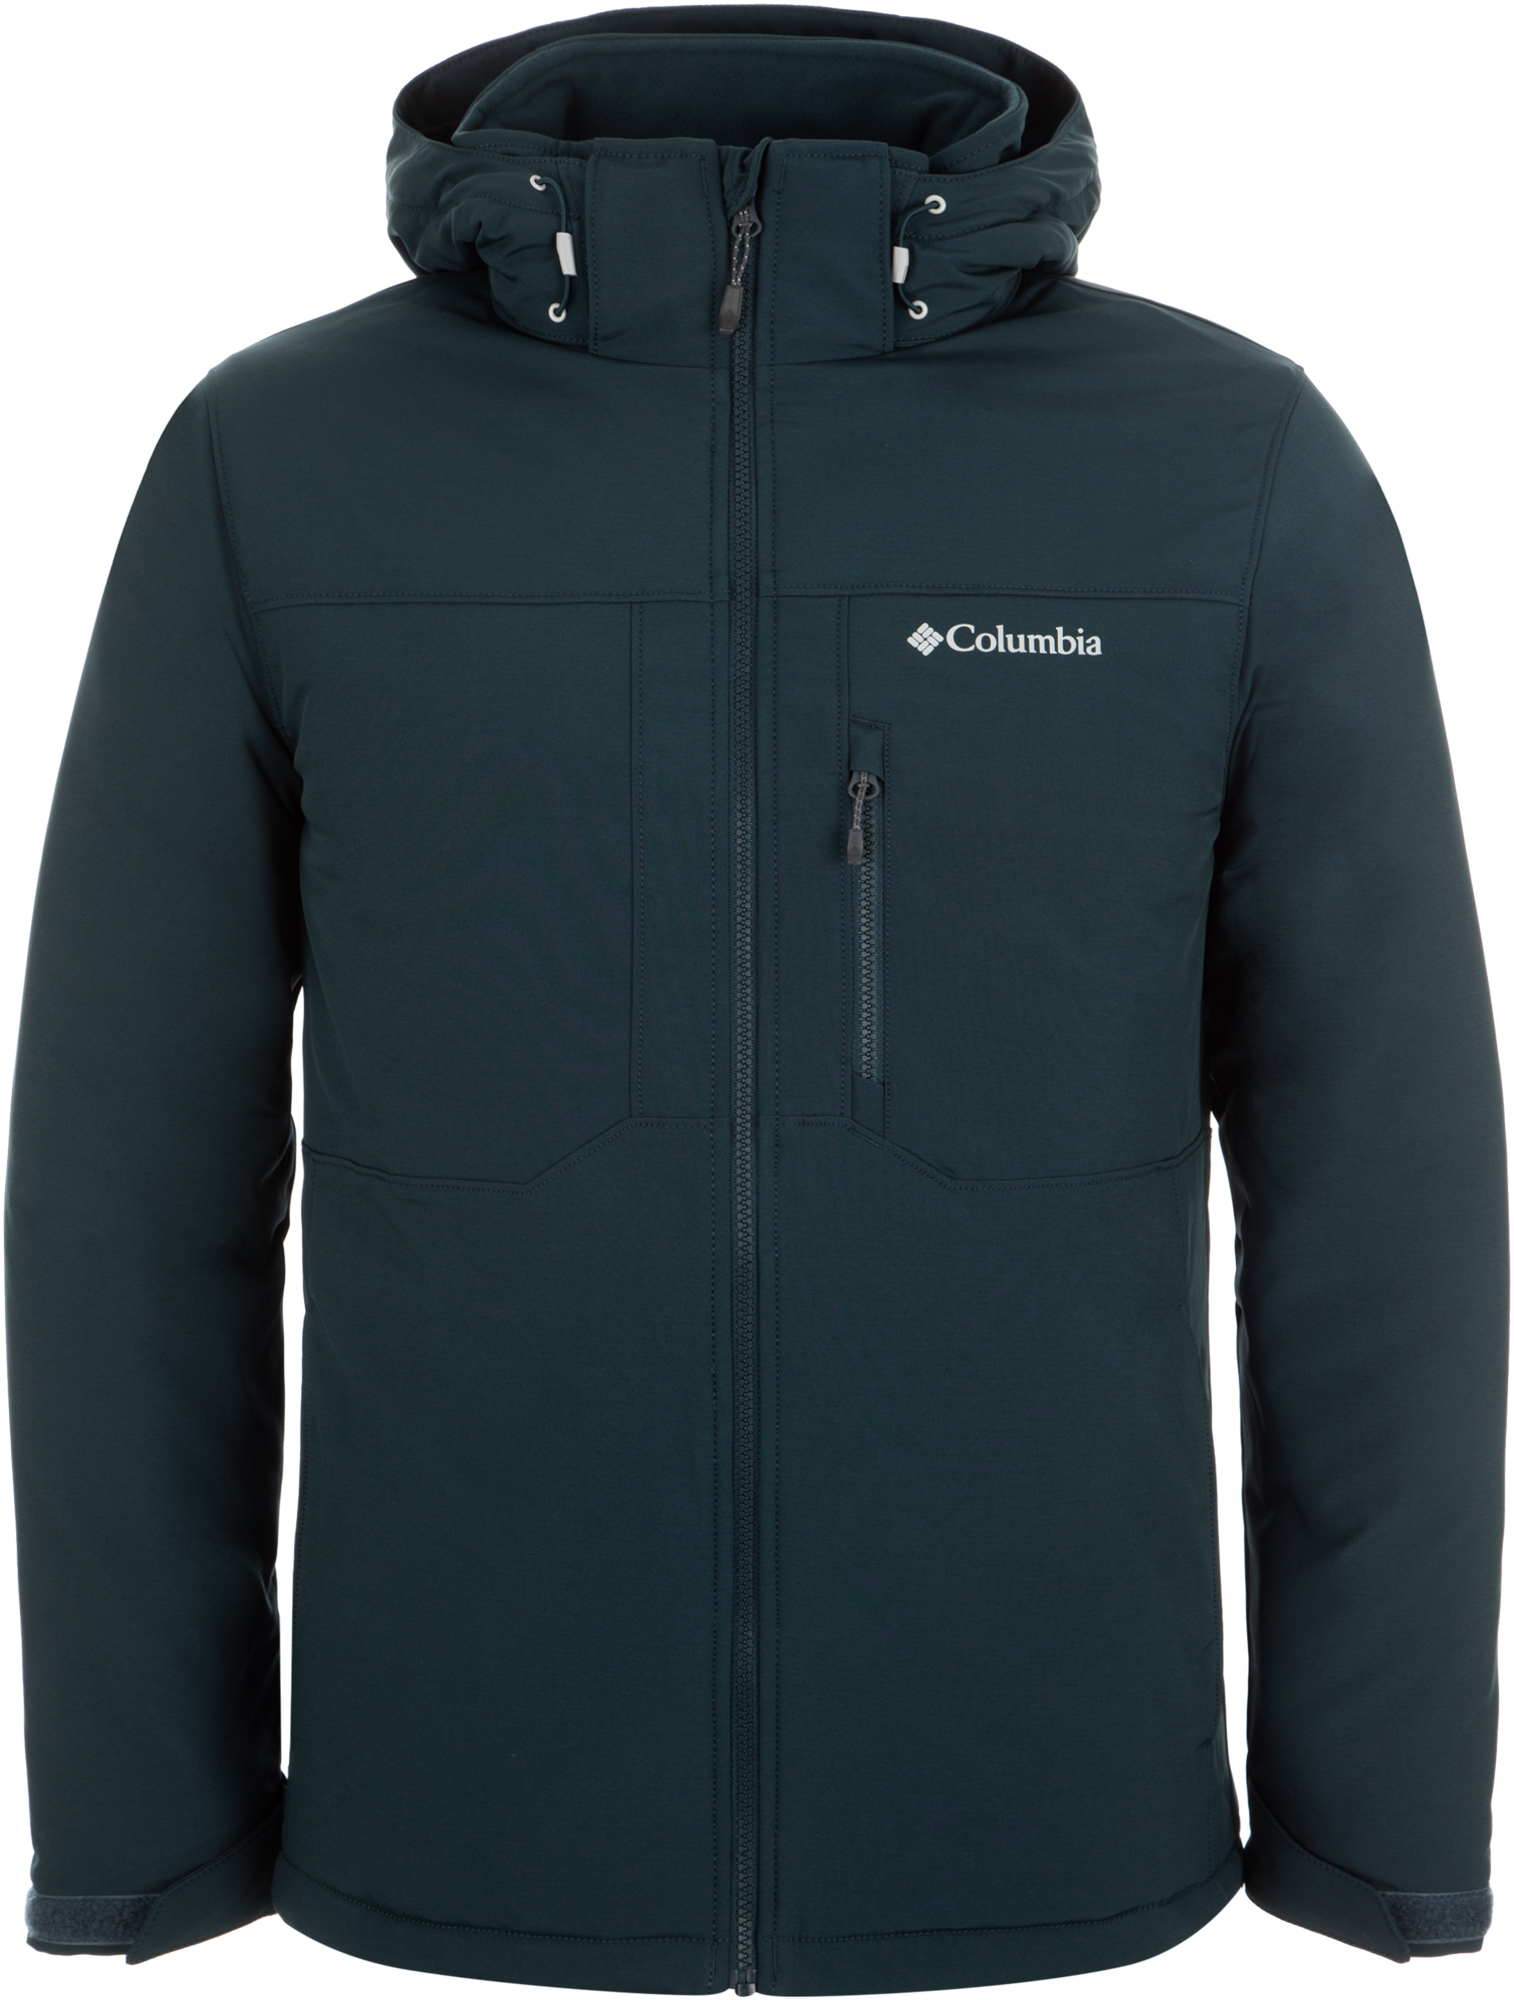 Columbia Куртка утепленная мужская Sumner Summit, размер 56